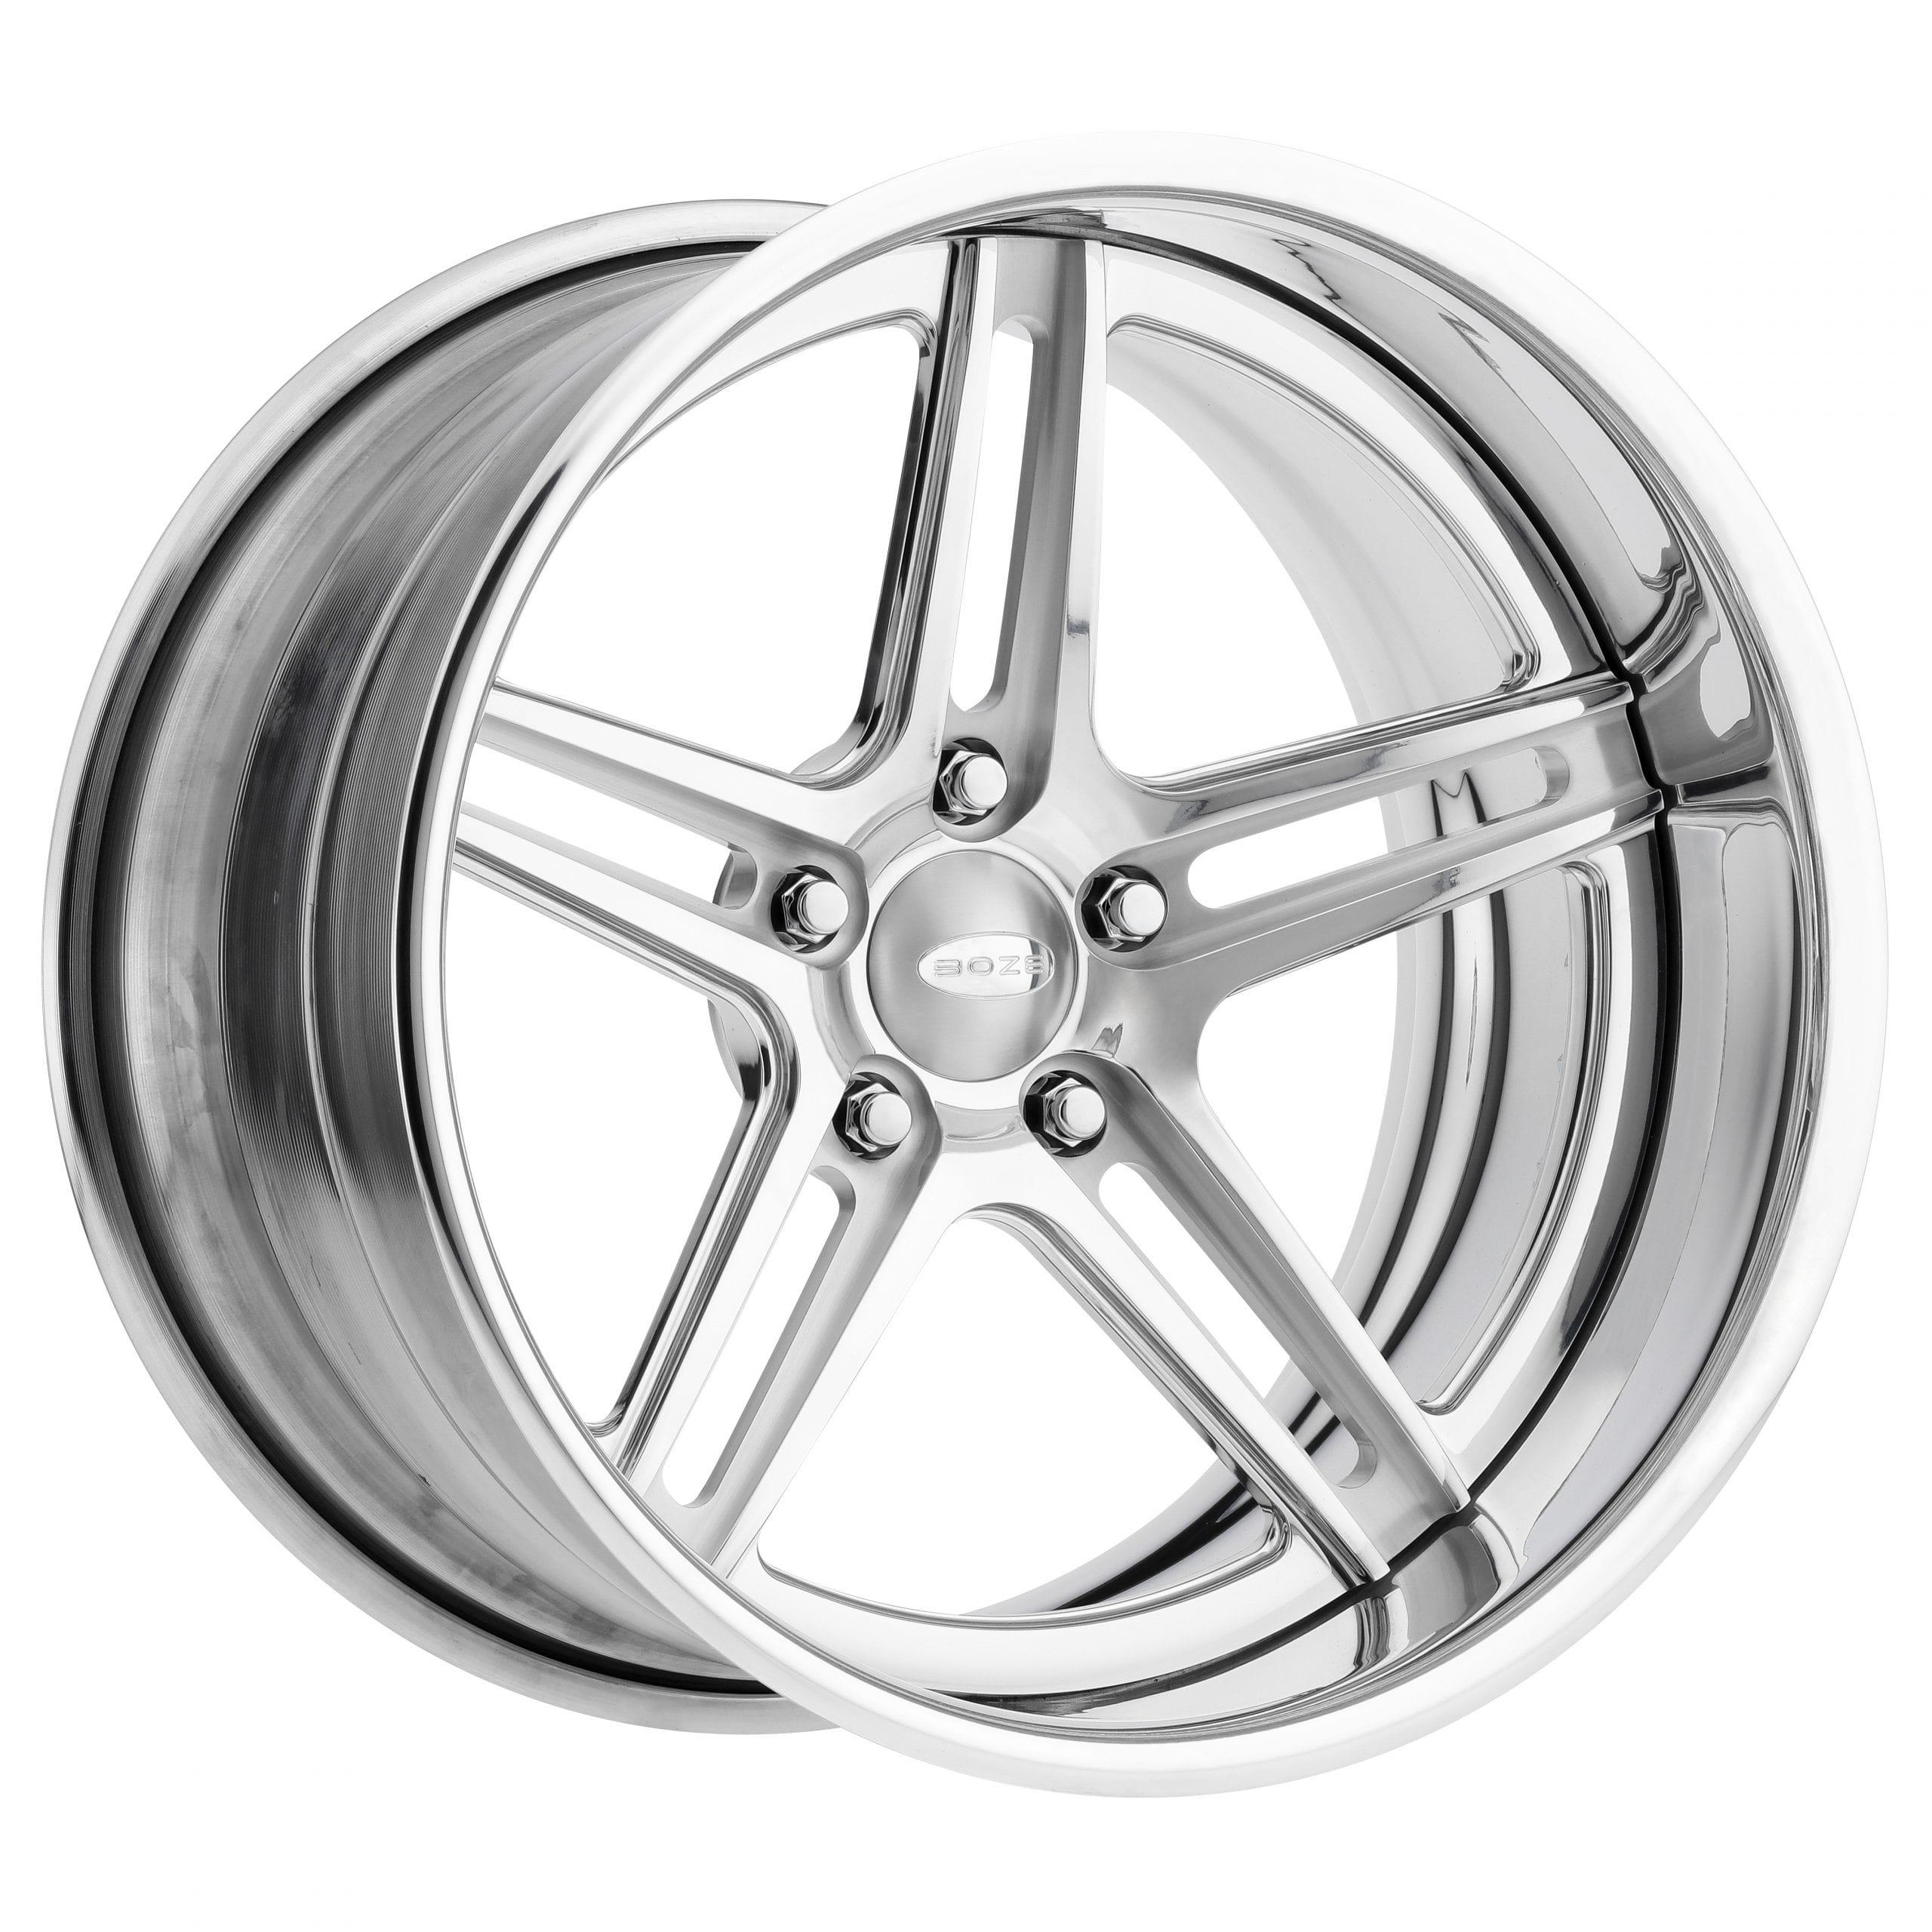 Boze Torque Scaled Victory Wheels Series Light Gray